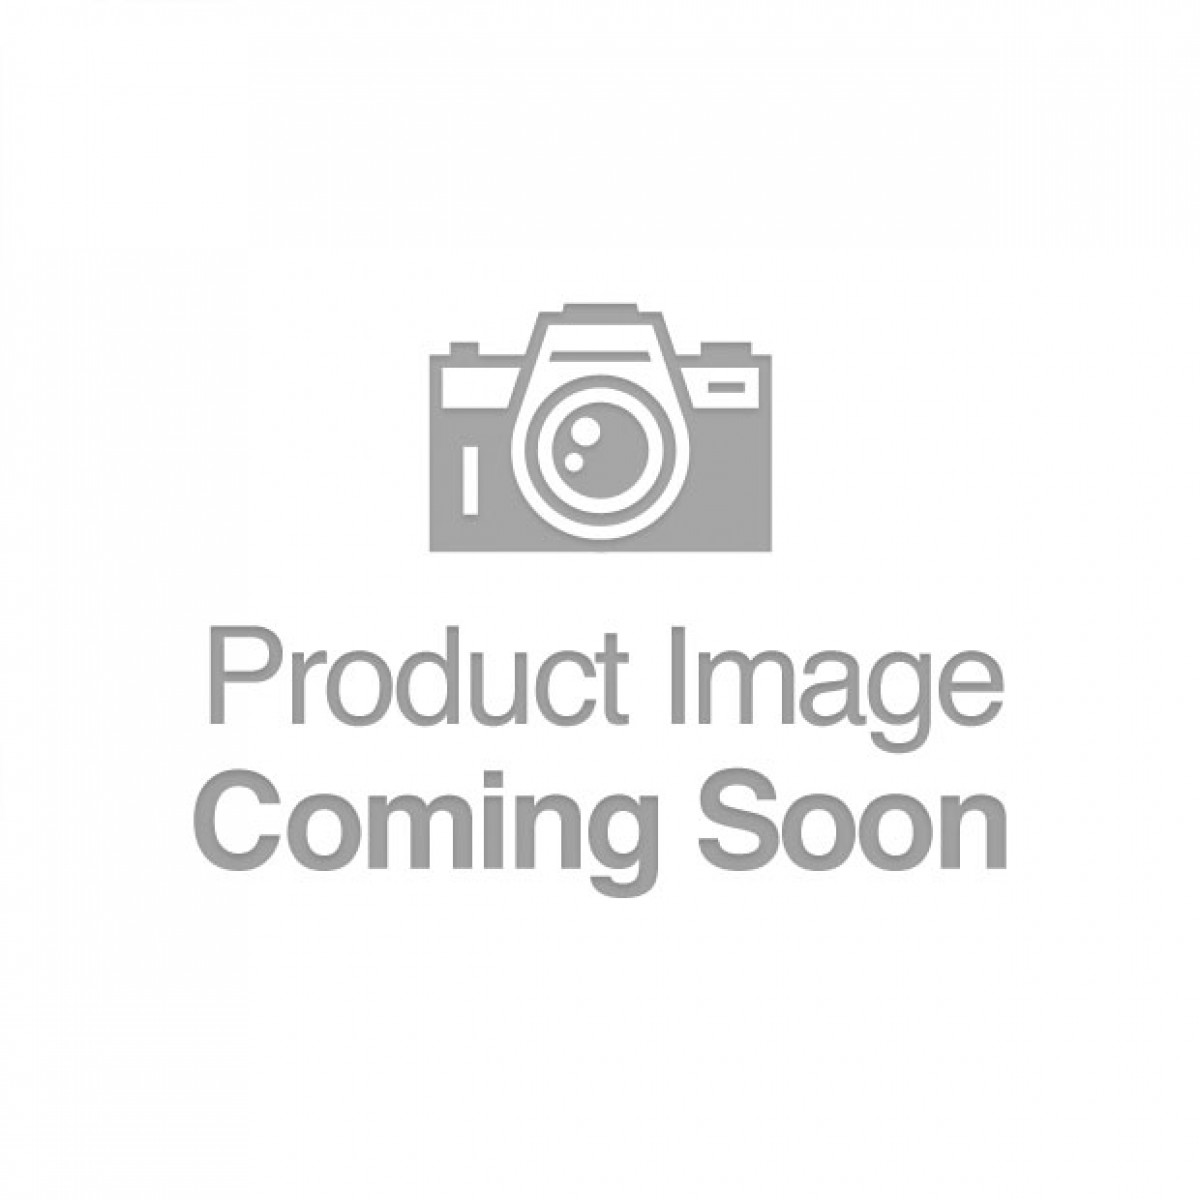 Curve Novelties Gossip Silicone Beaded Vibrator 50x- Violet